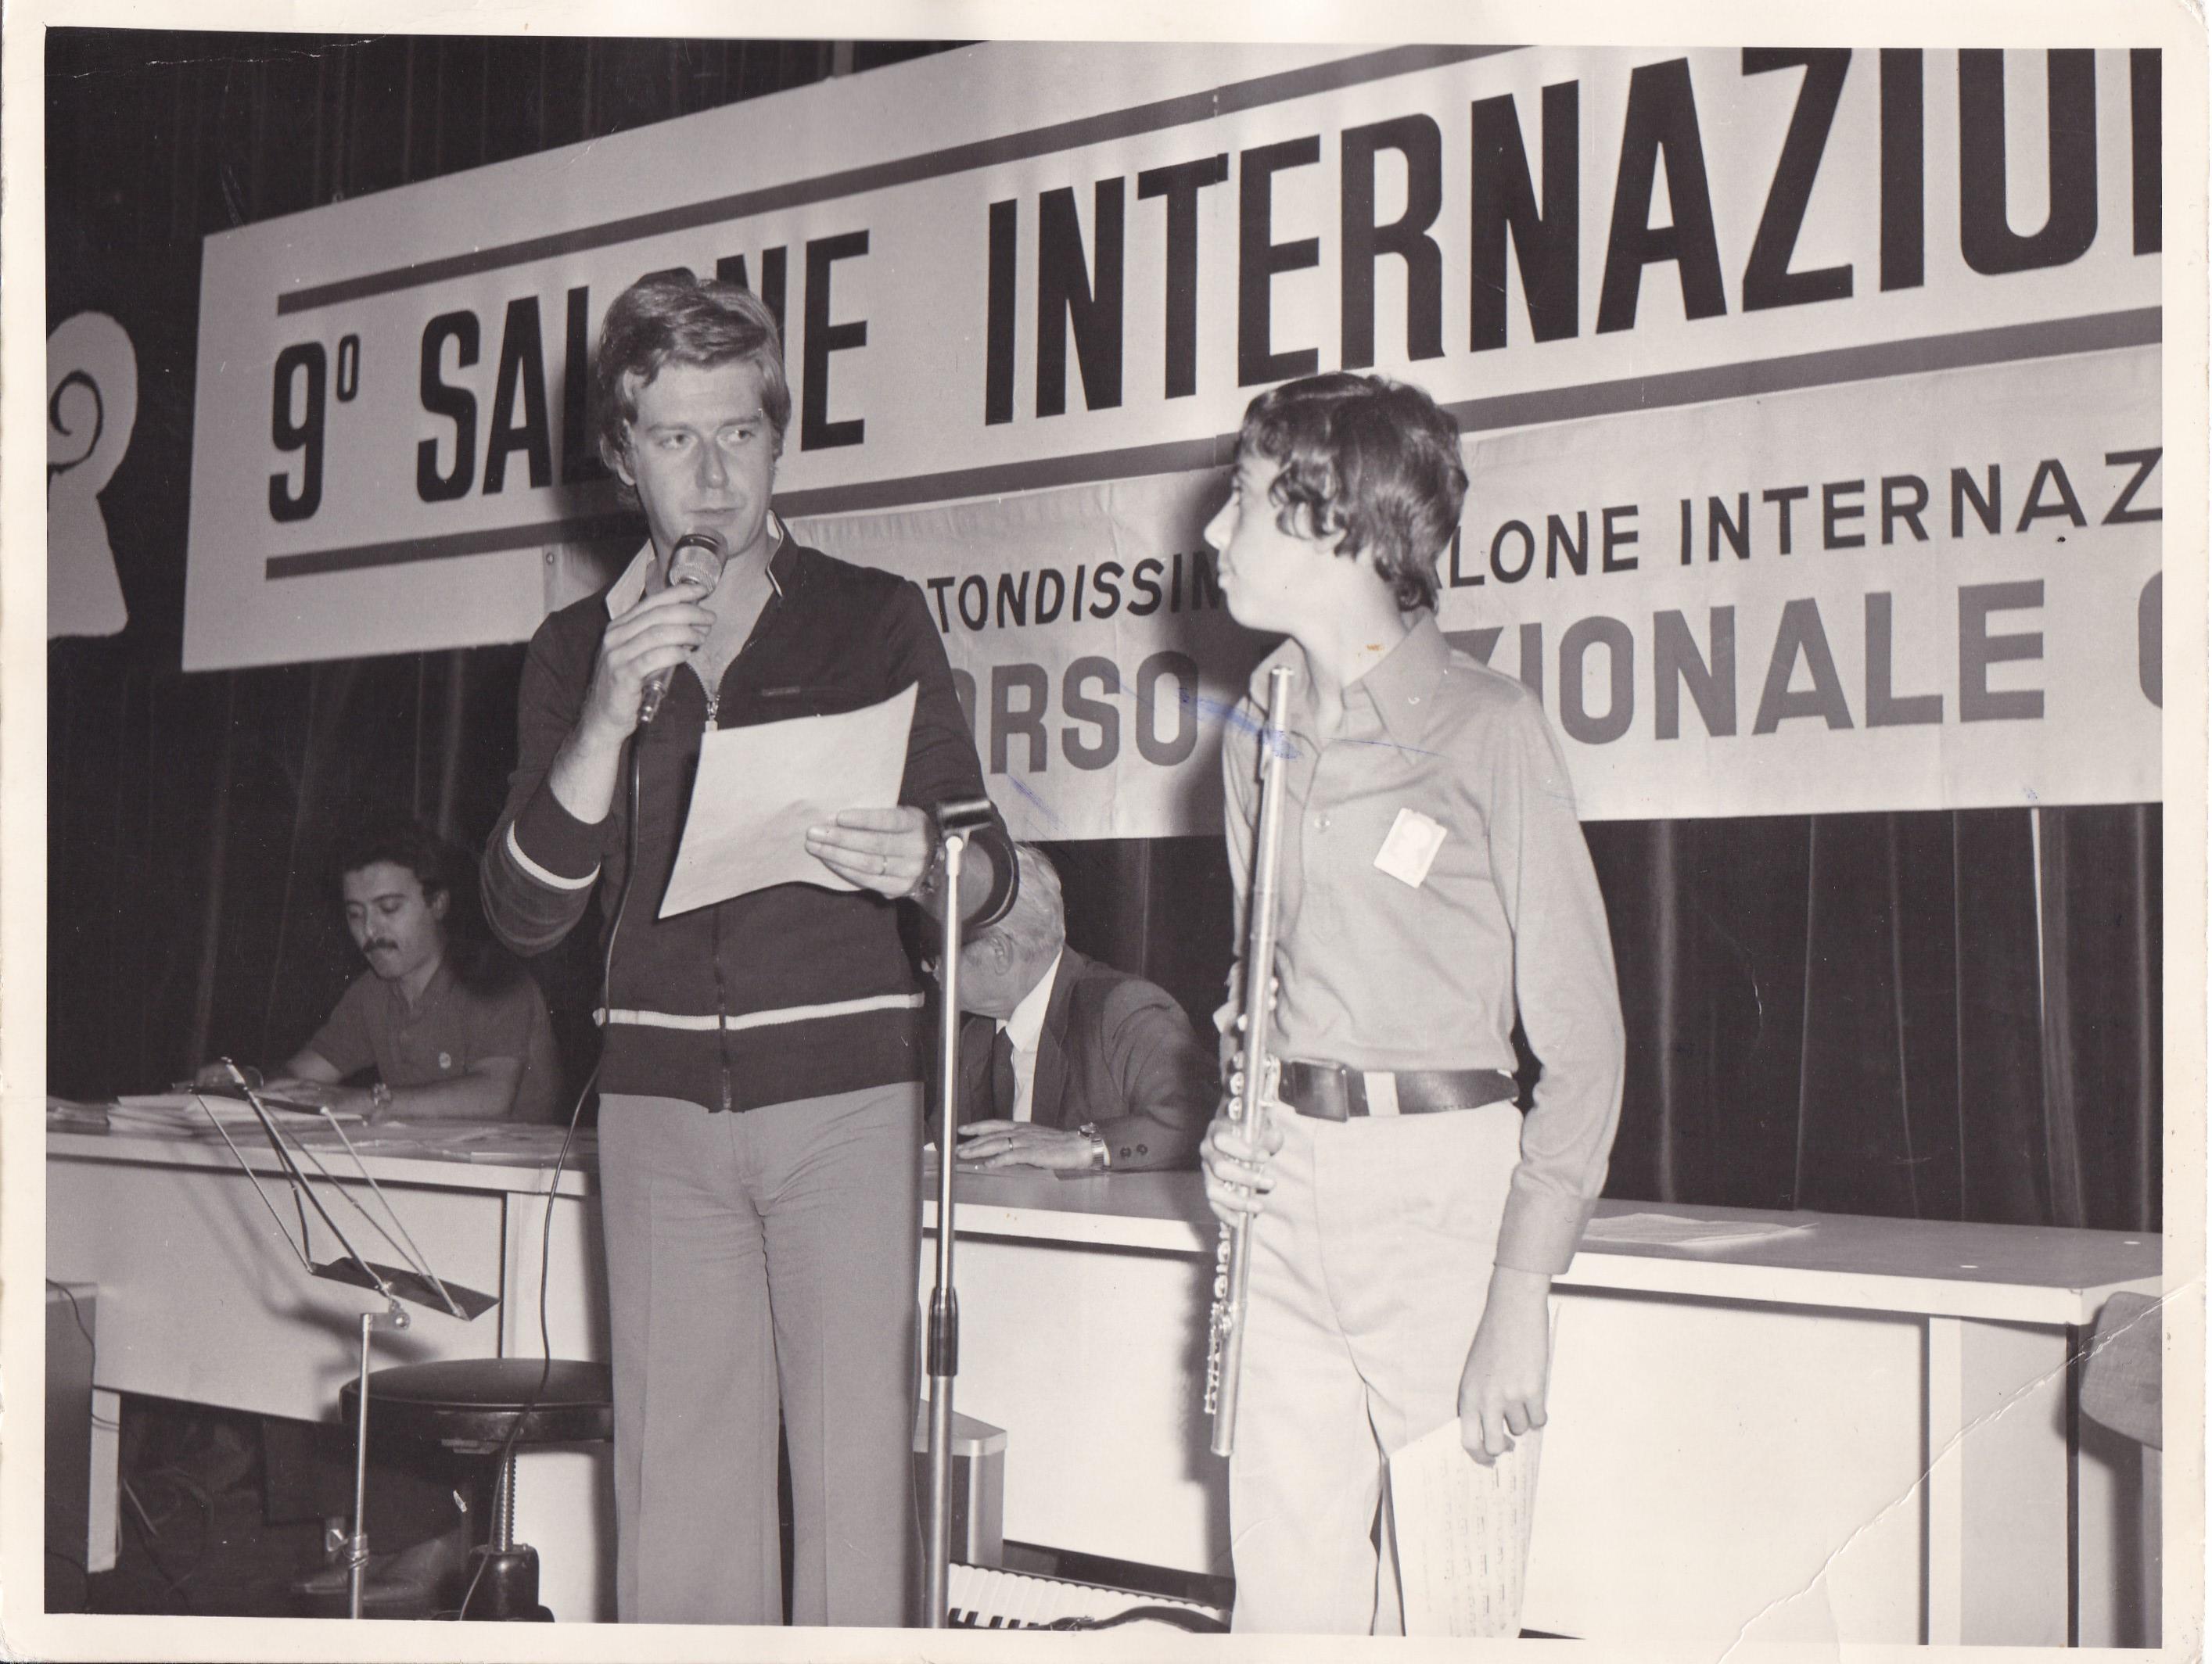 Claudio Lippi and Fernando Fracassi